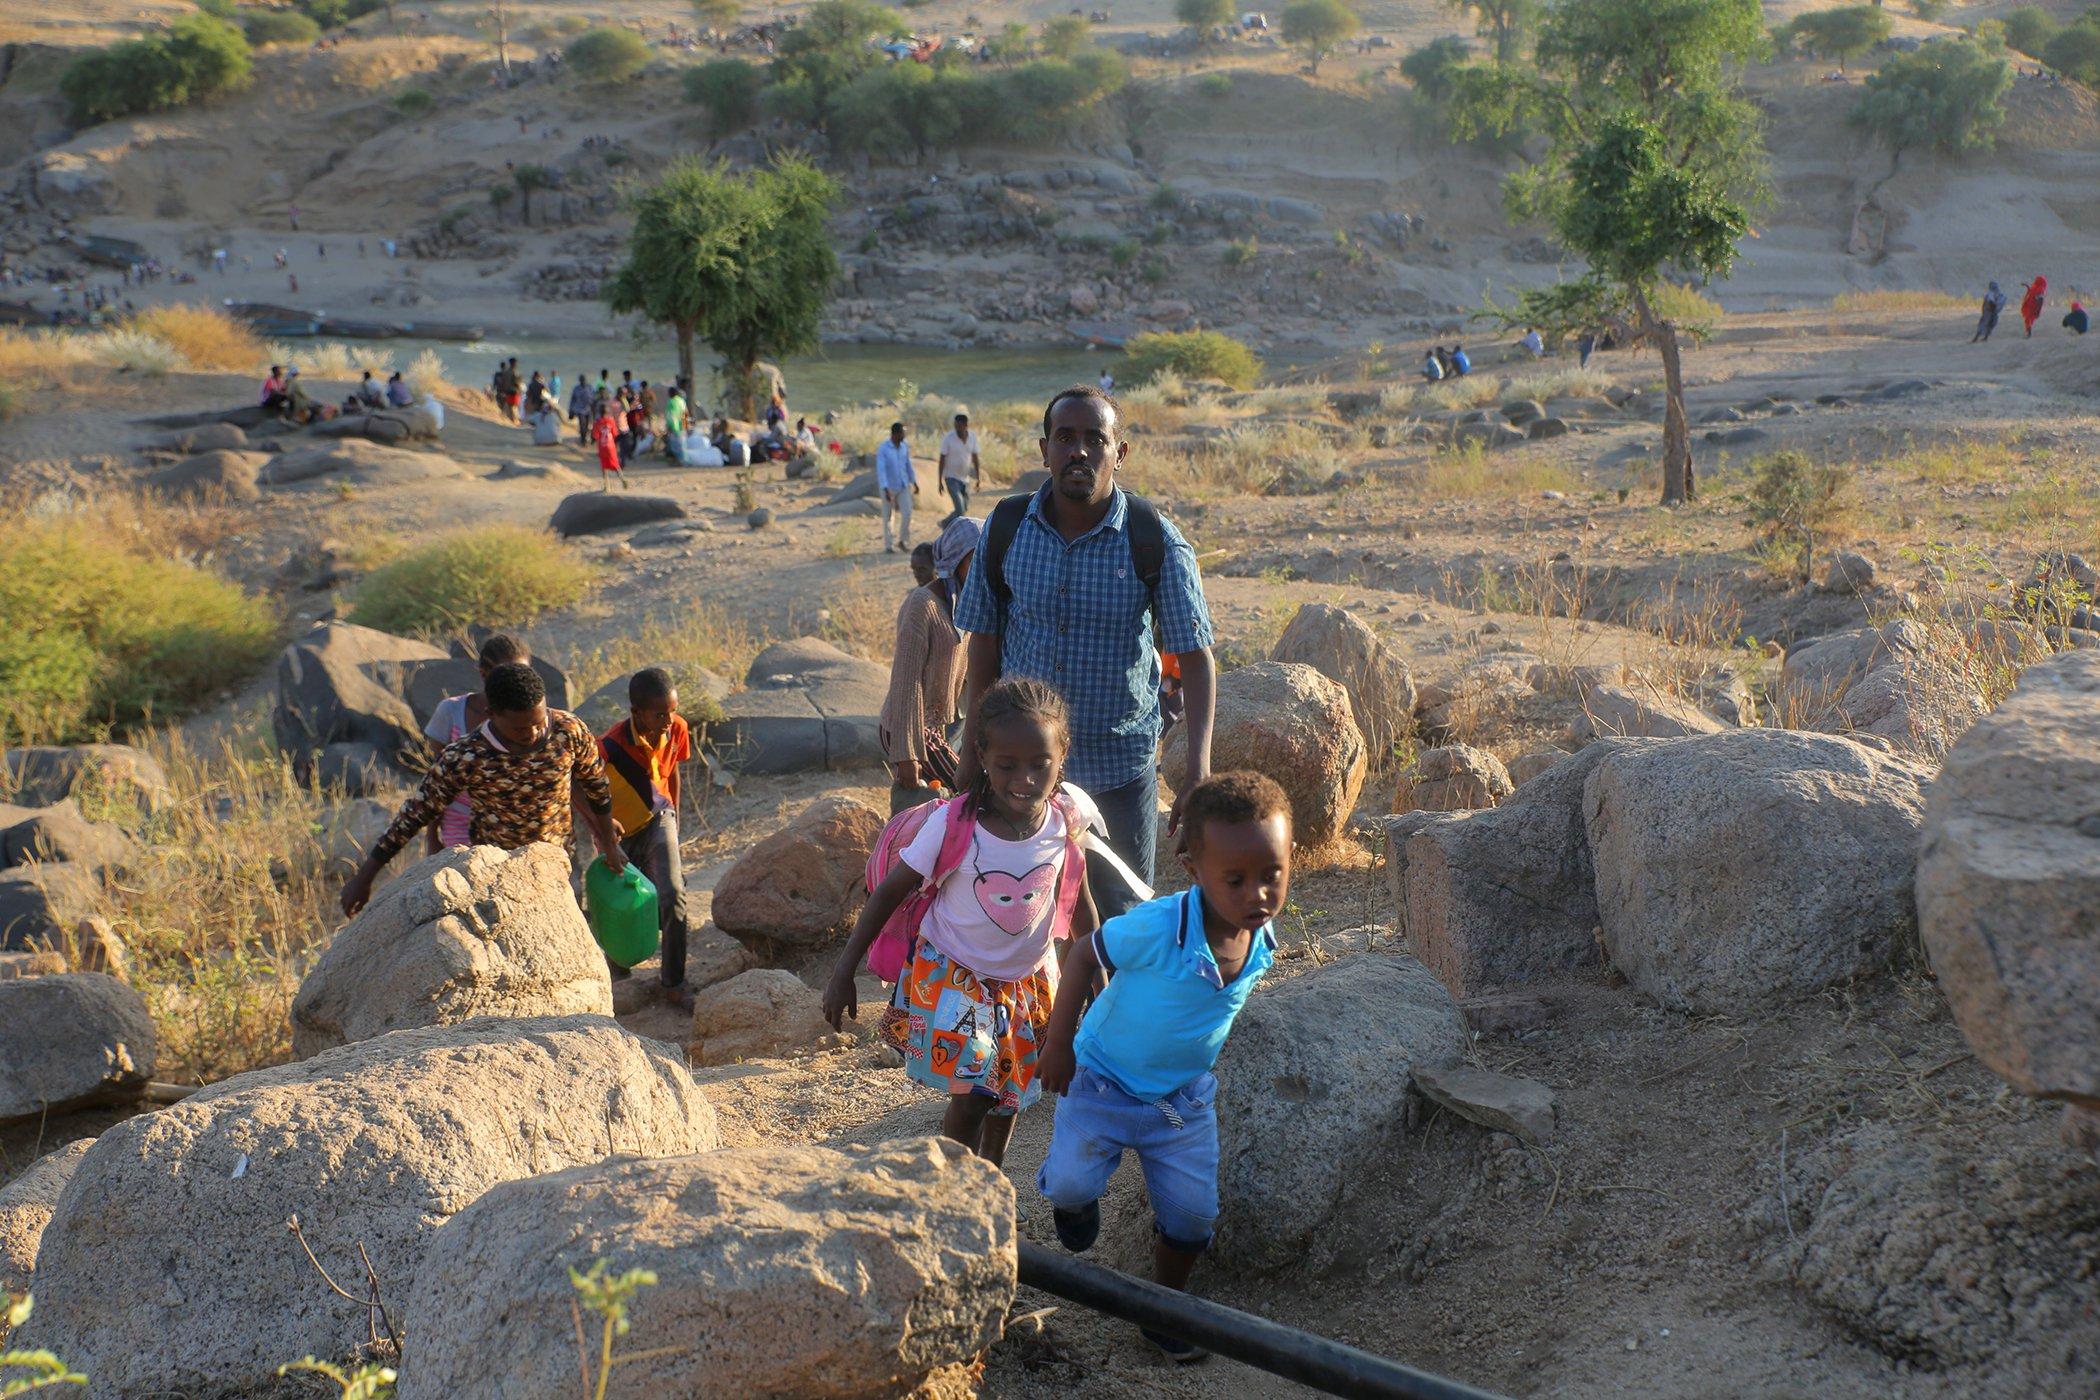 Ethiopia-Tigray-Refugees-Humanitarian-Crisis-UNHCR-003.jpg